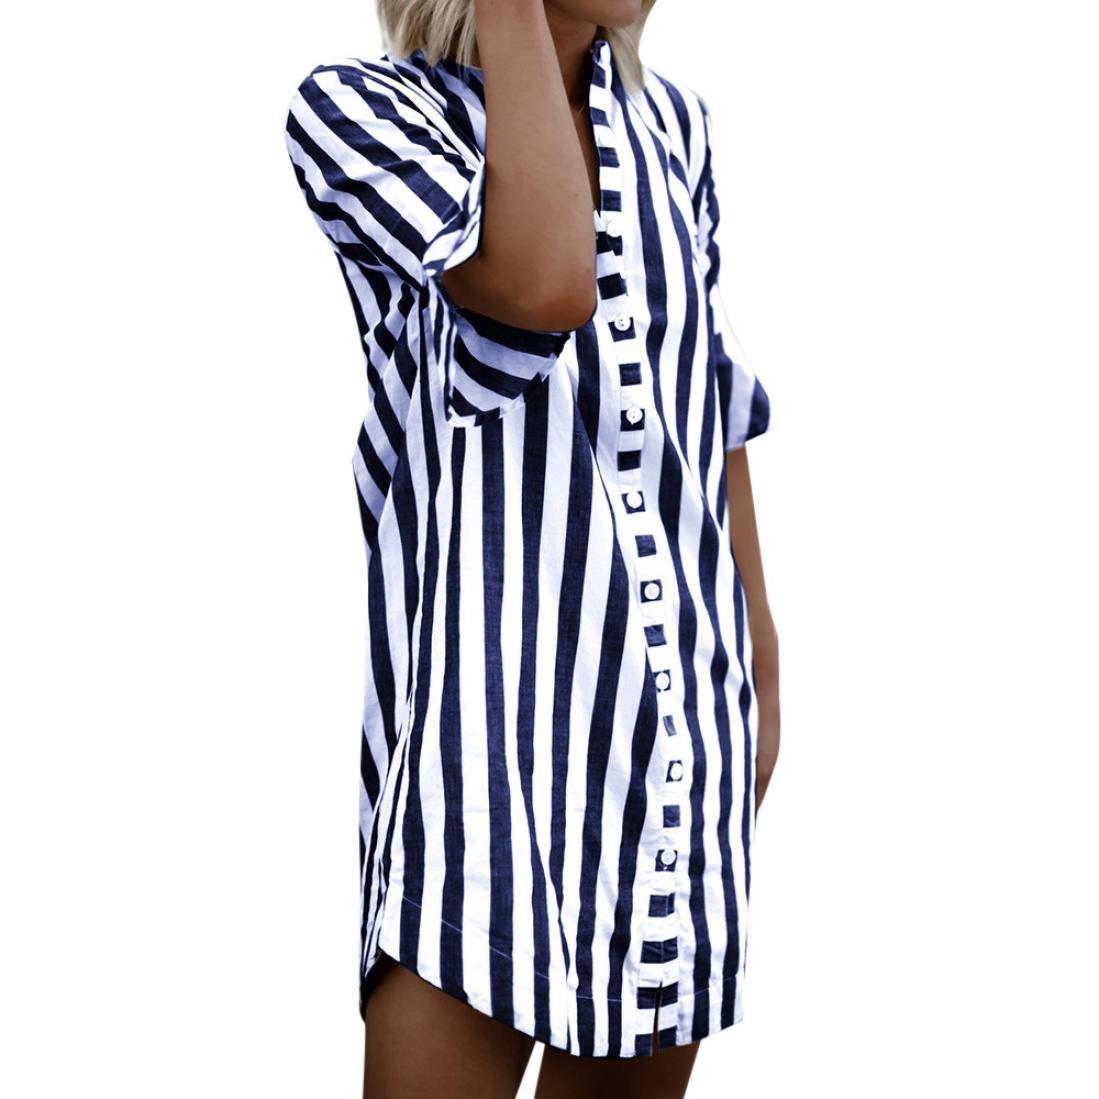 5535e542111  Material  Polyester- Women Horn Sleeve Striped Half Sleeve Tops Long  Blouse horn sleeve horn sleeve dresses for women horn sleeves blouses horn  sleeve ...